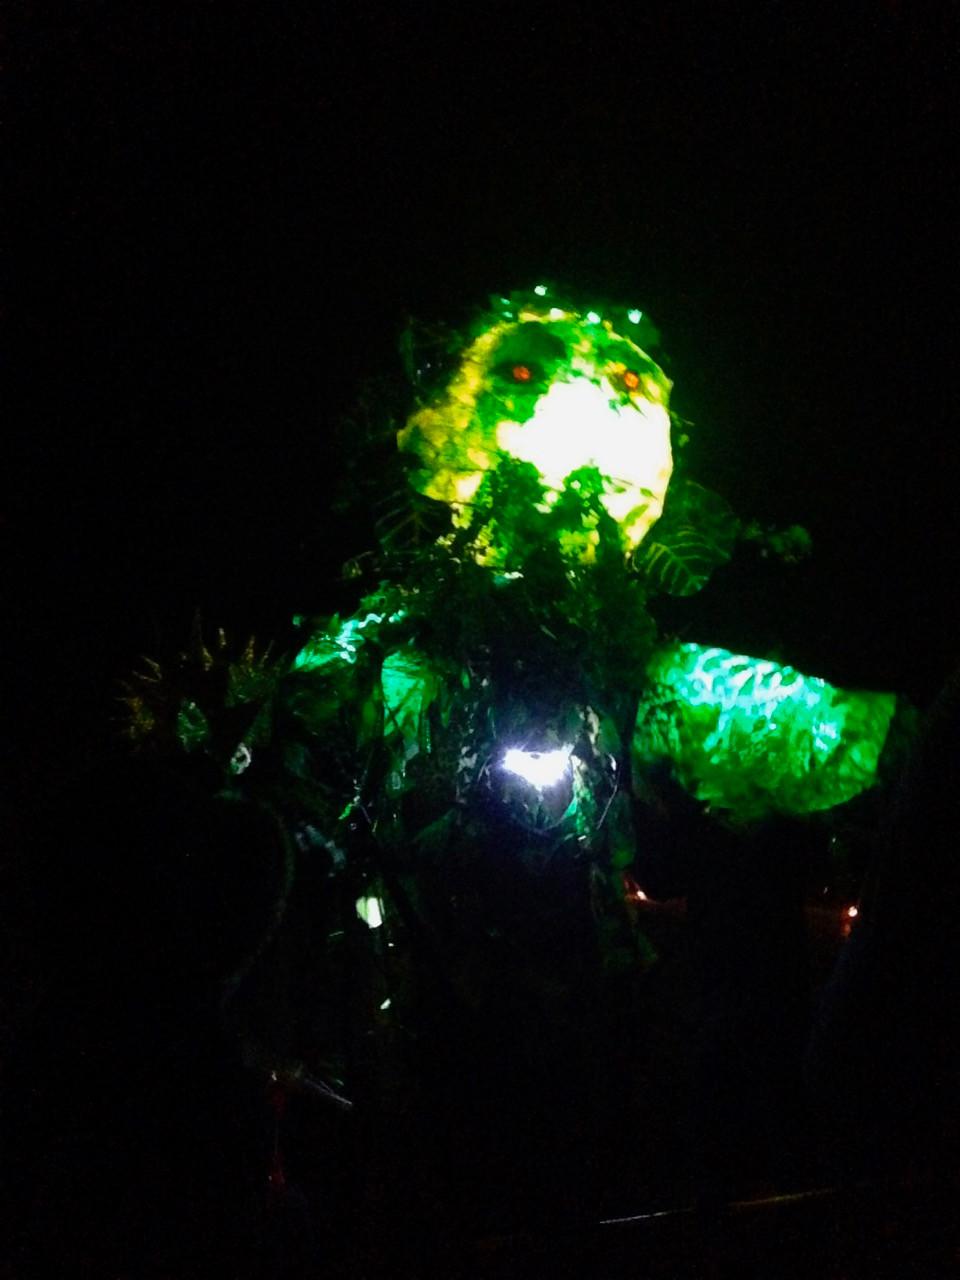 Green Man gigant Puppet Marsden